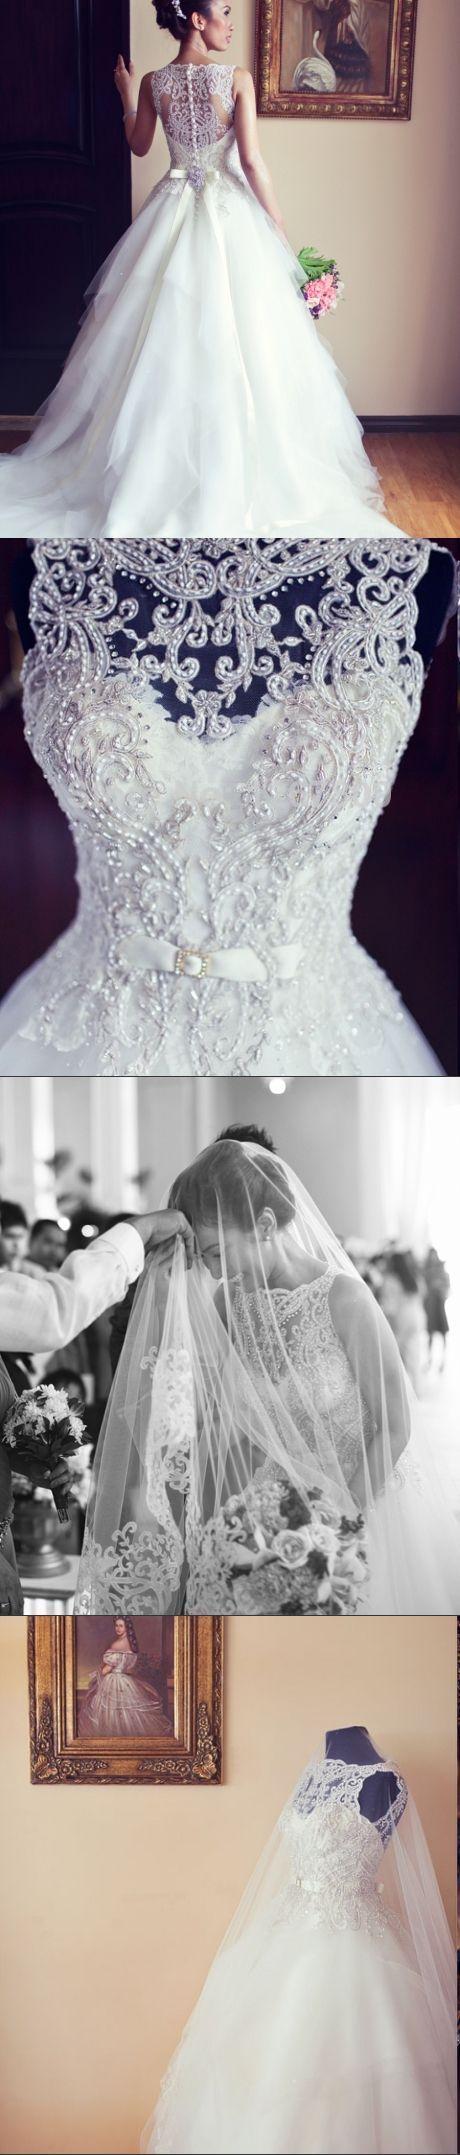 best mariage images on pinterest wedding ideas wedding stuff